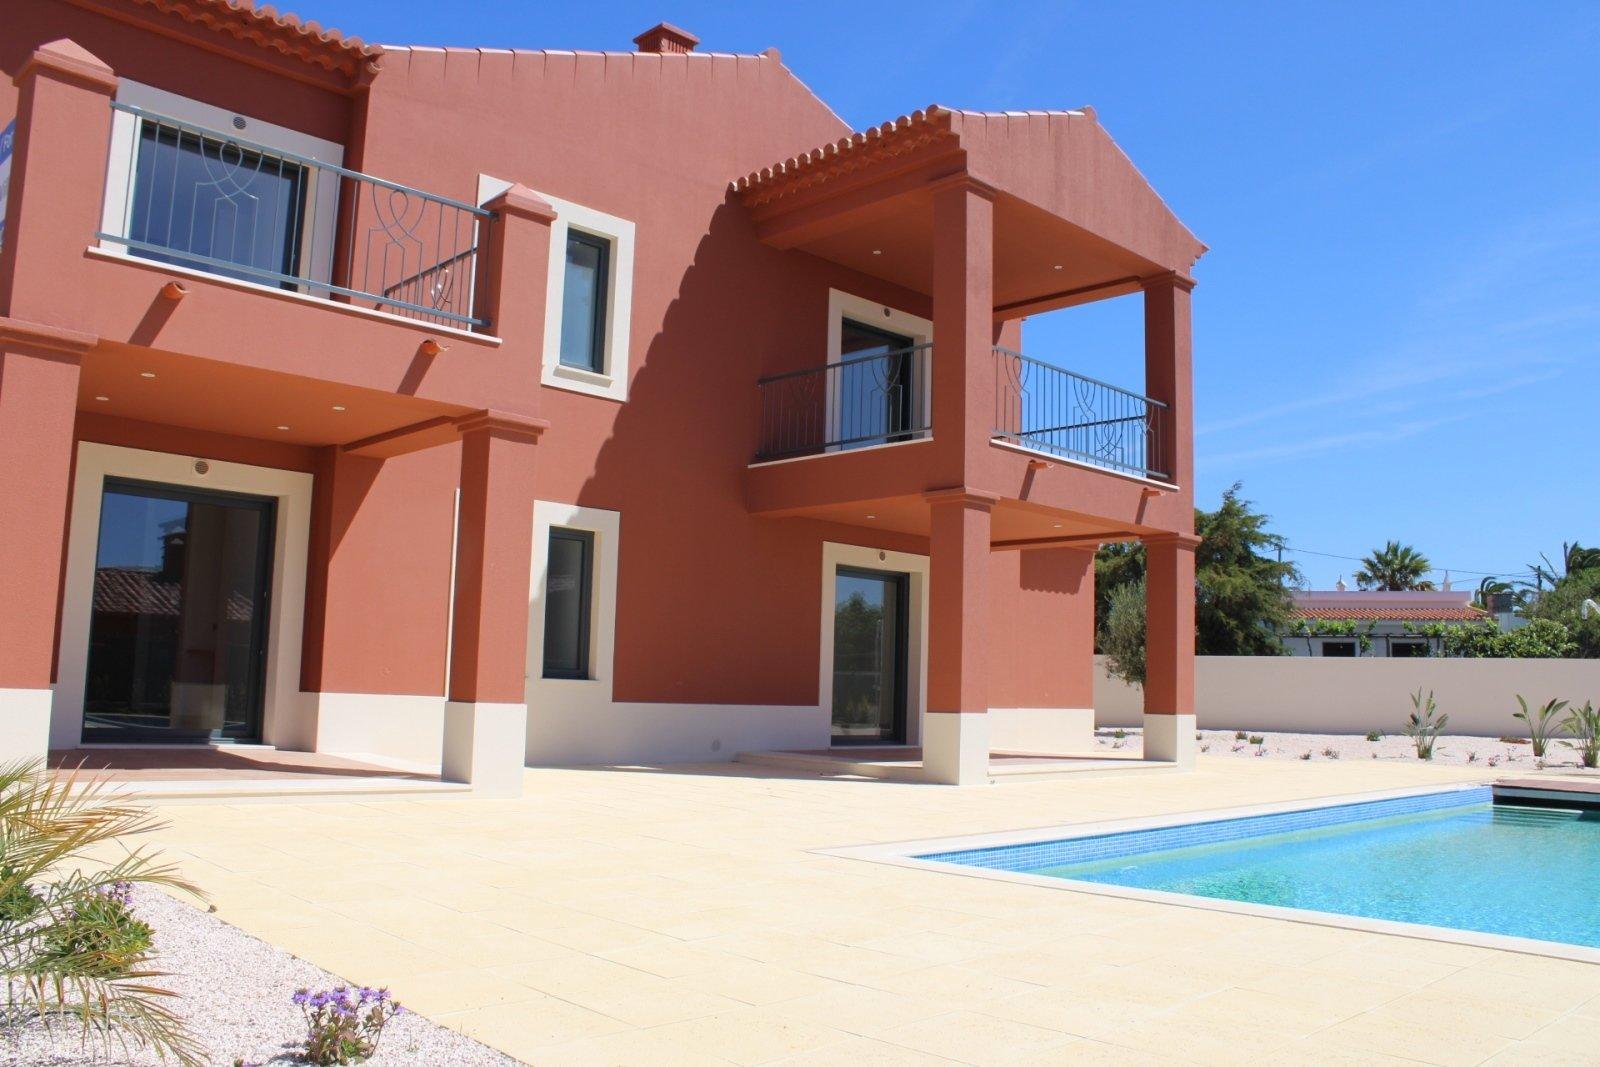 3 Bedroom Villa Lagoa, Western Algarve Ref: GV619